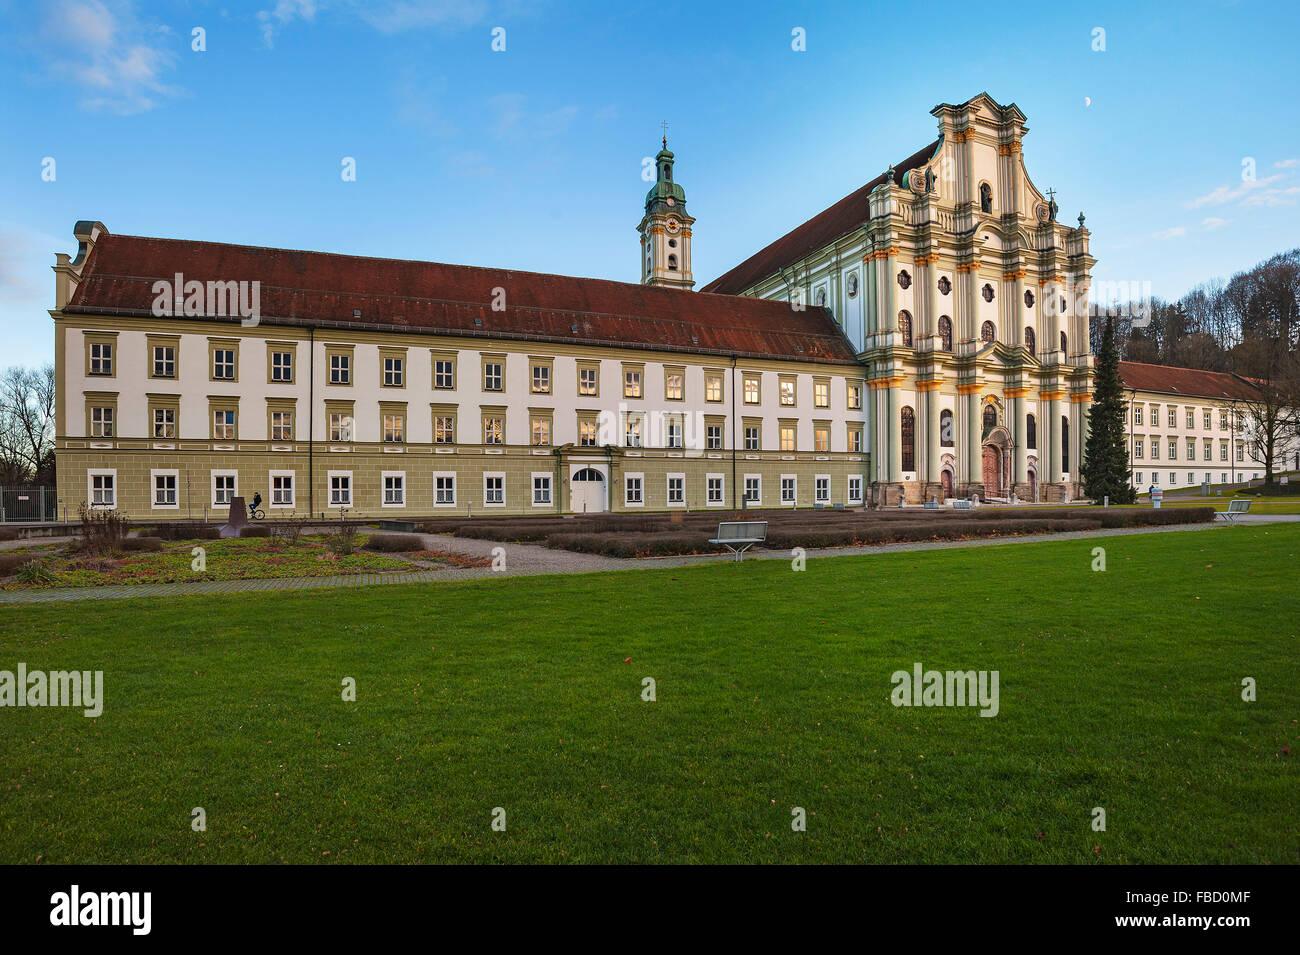 Fürstenfeld Abbey, former Cistercian abbey, Furstenfeldbruck, Bavaria, Germany Stock Photo